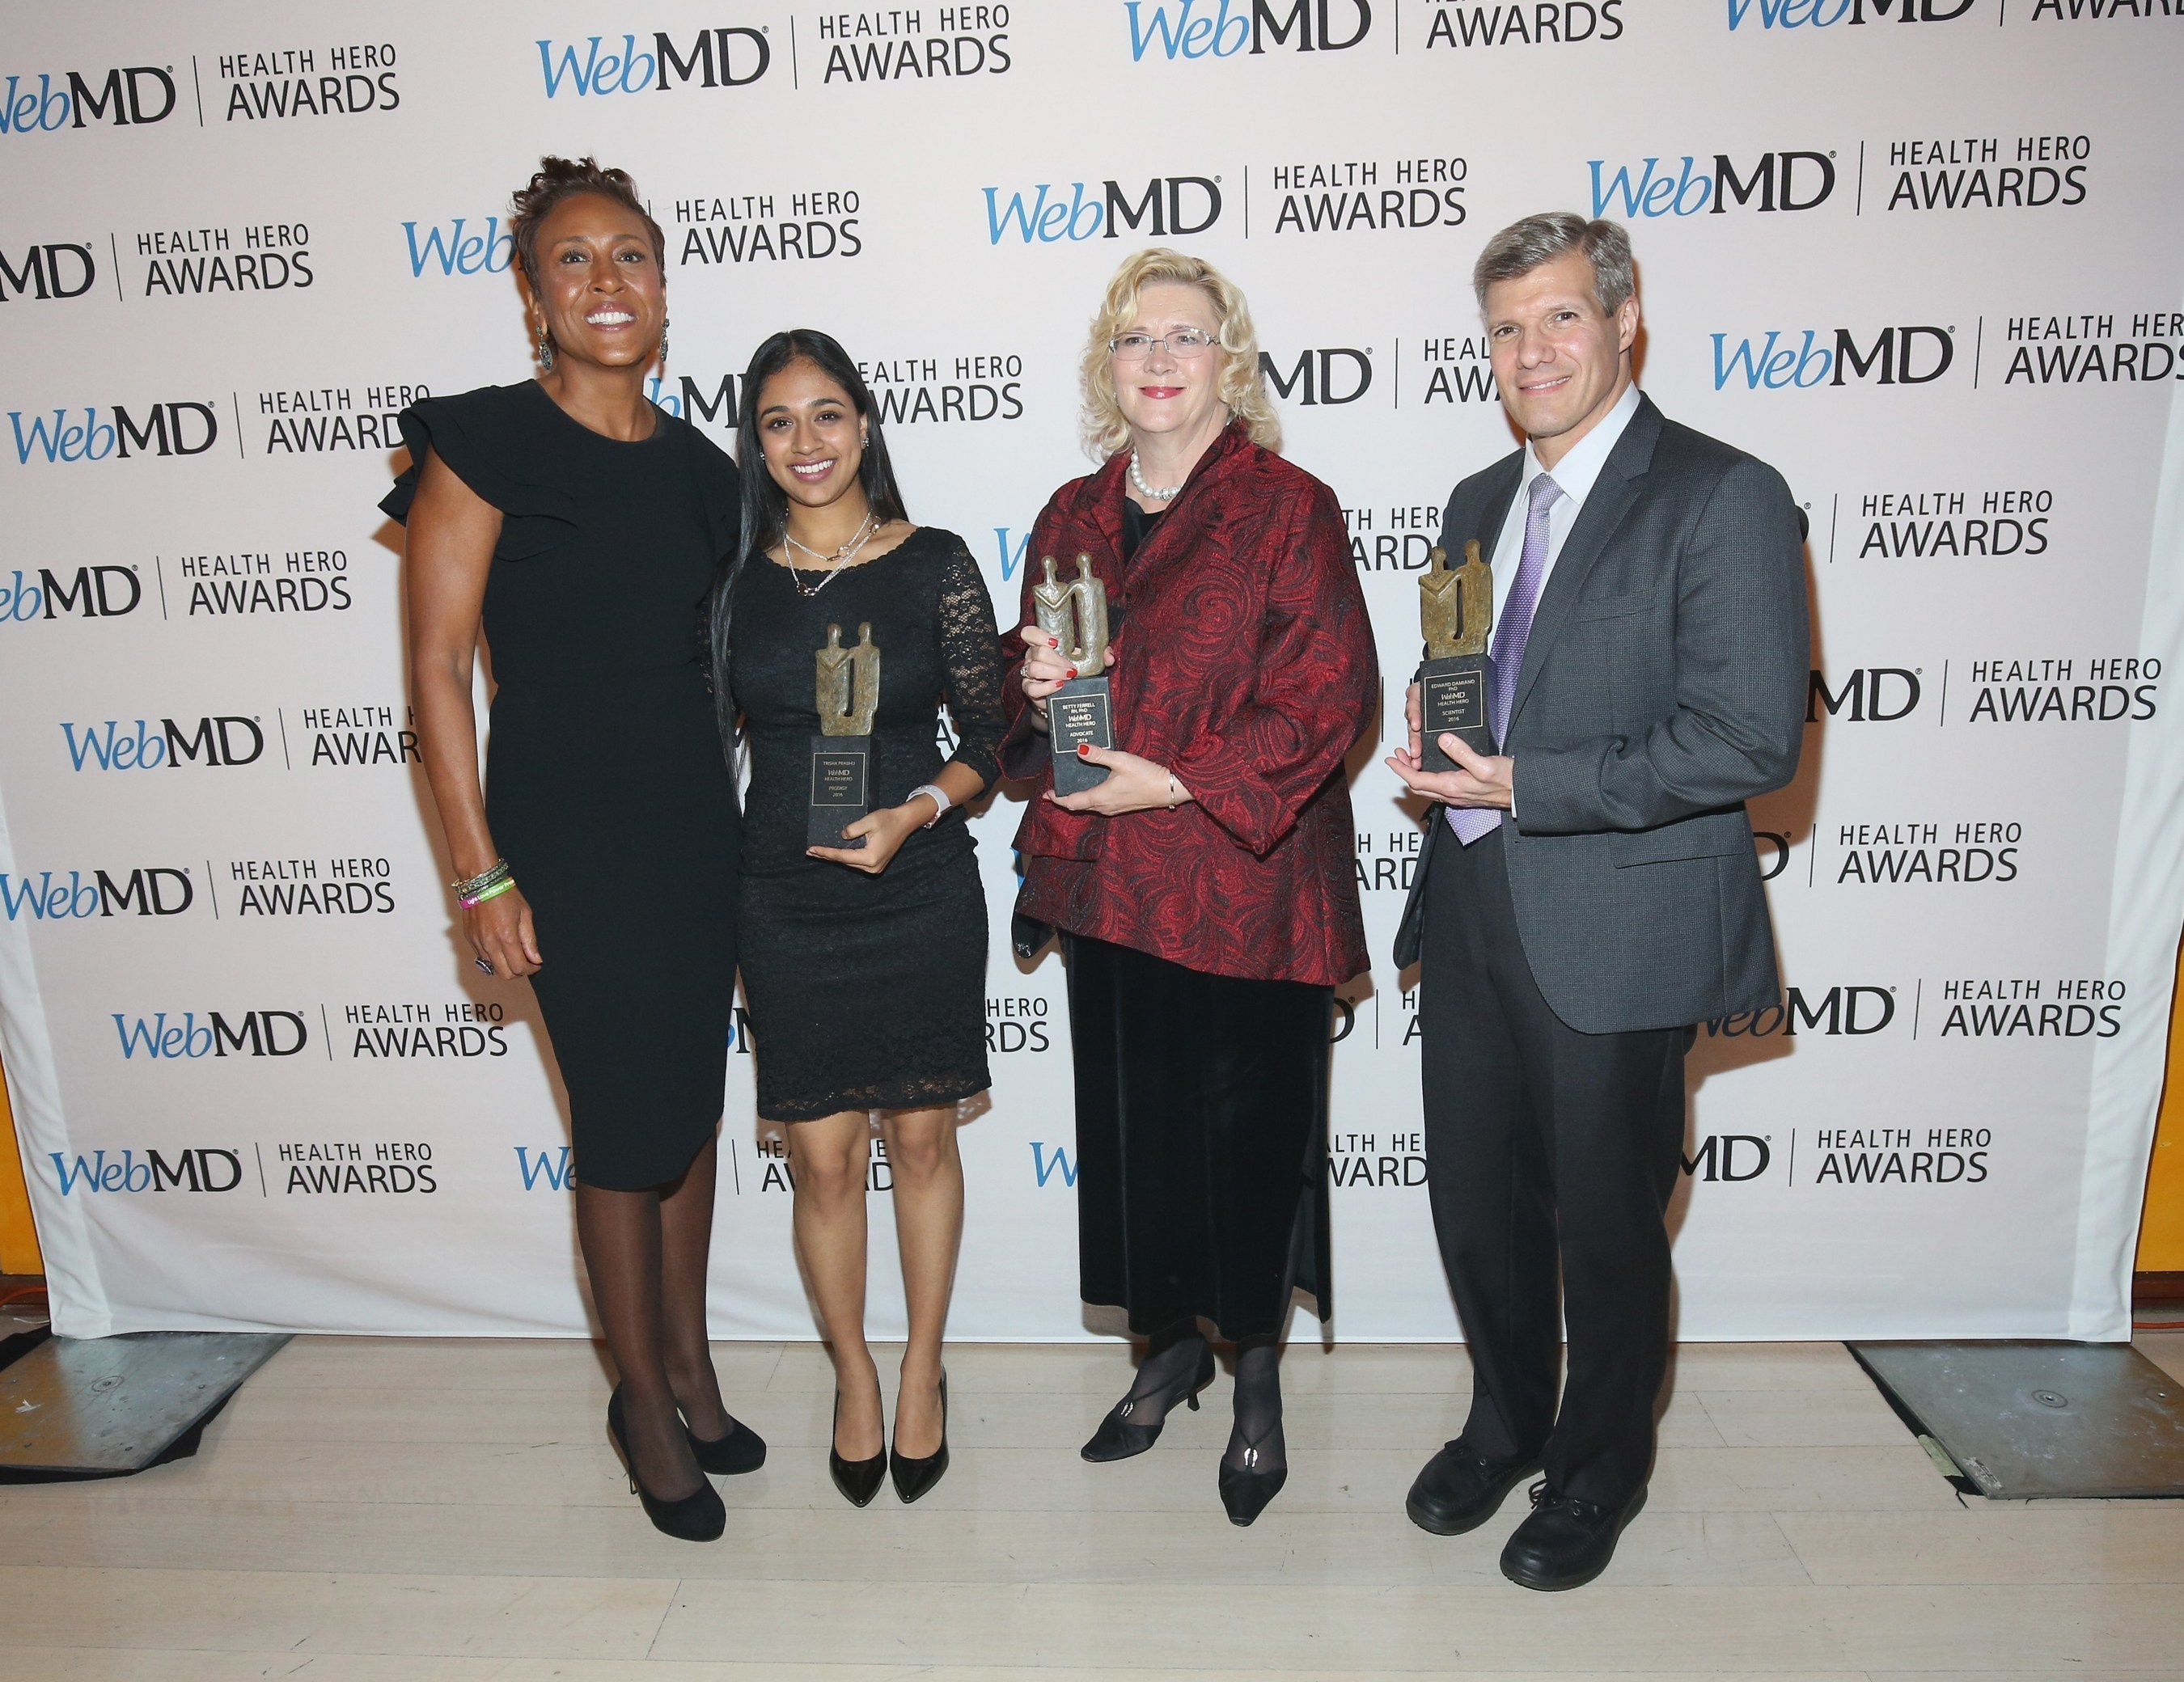 Caption: WebMD Health Hero Awards host Robin Roberts, Prodigy Award recipient Trisha Prabhu, Advocate Award recipient Betty Ferrell, RN, PhD and Scientist Award recipient Ed Damiano, PhD attend the 2016 WebMD Health Heroes Awards on November 3, 2016 in New York City.